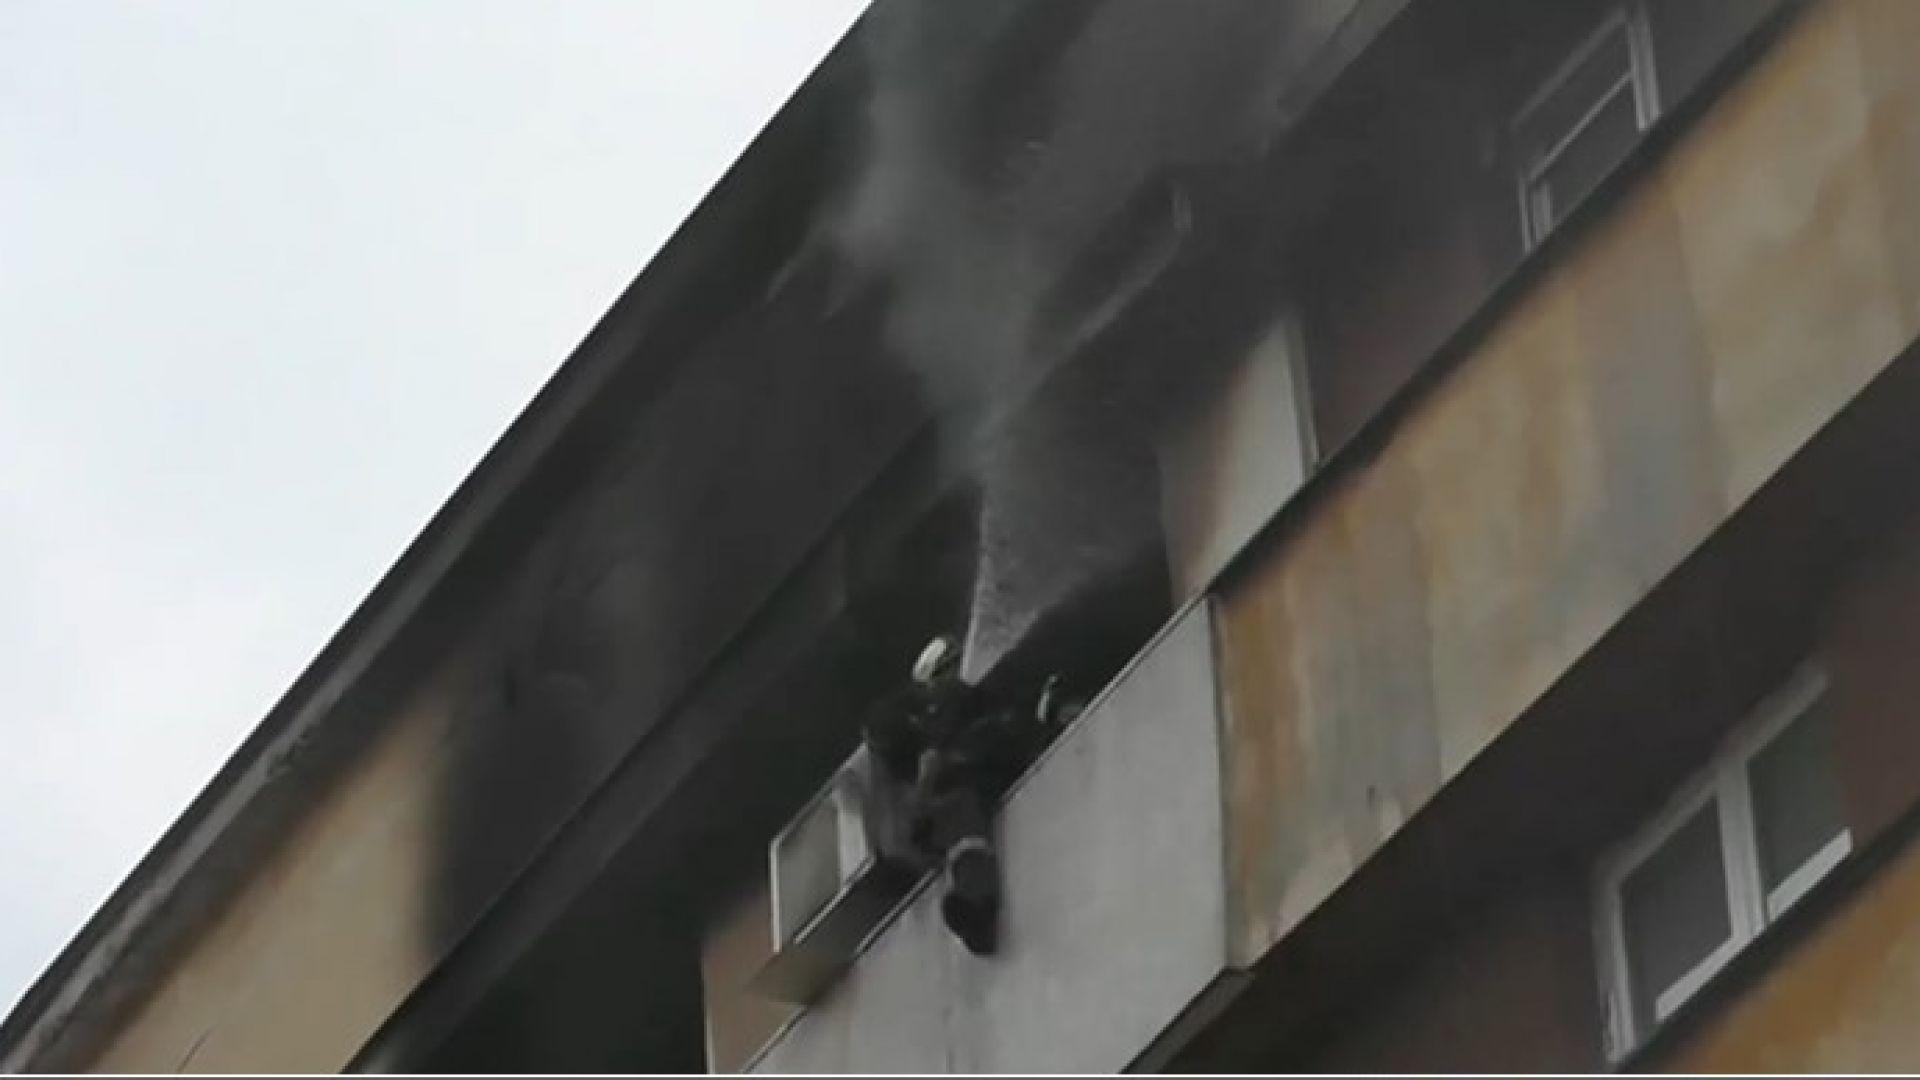 Психично нестабилен мъж подпали апартамент, още двама пострадаха